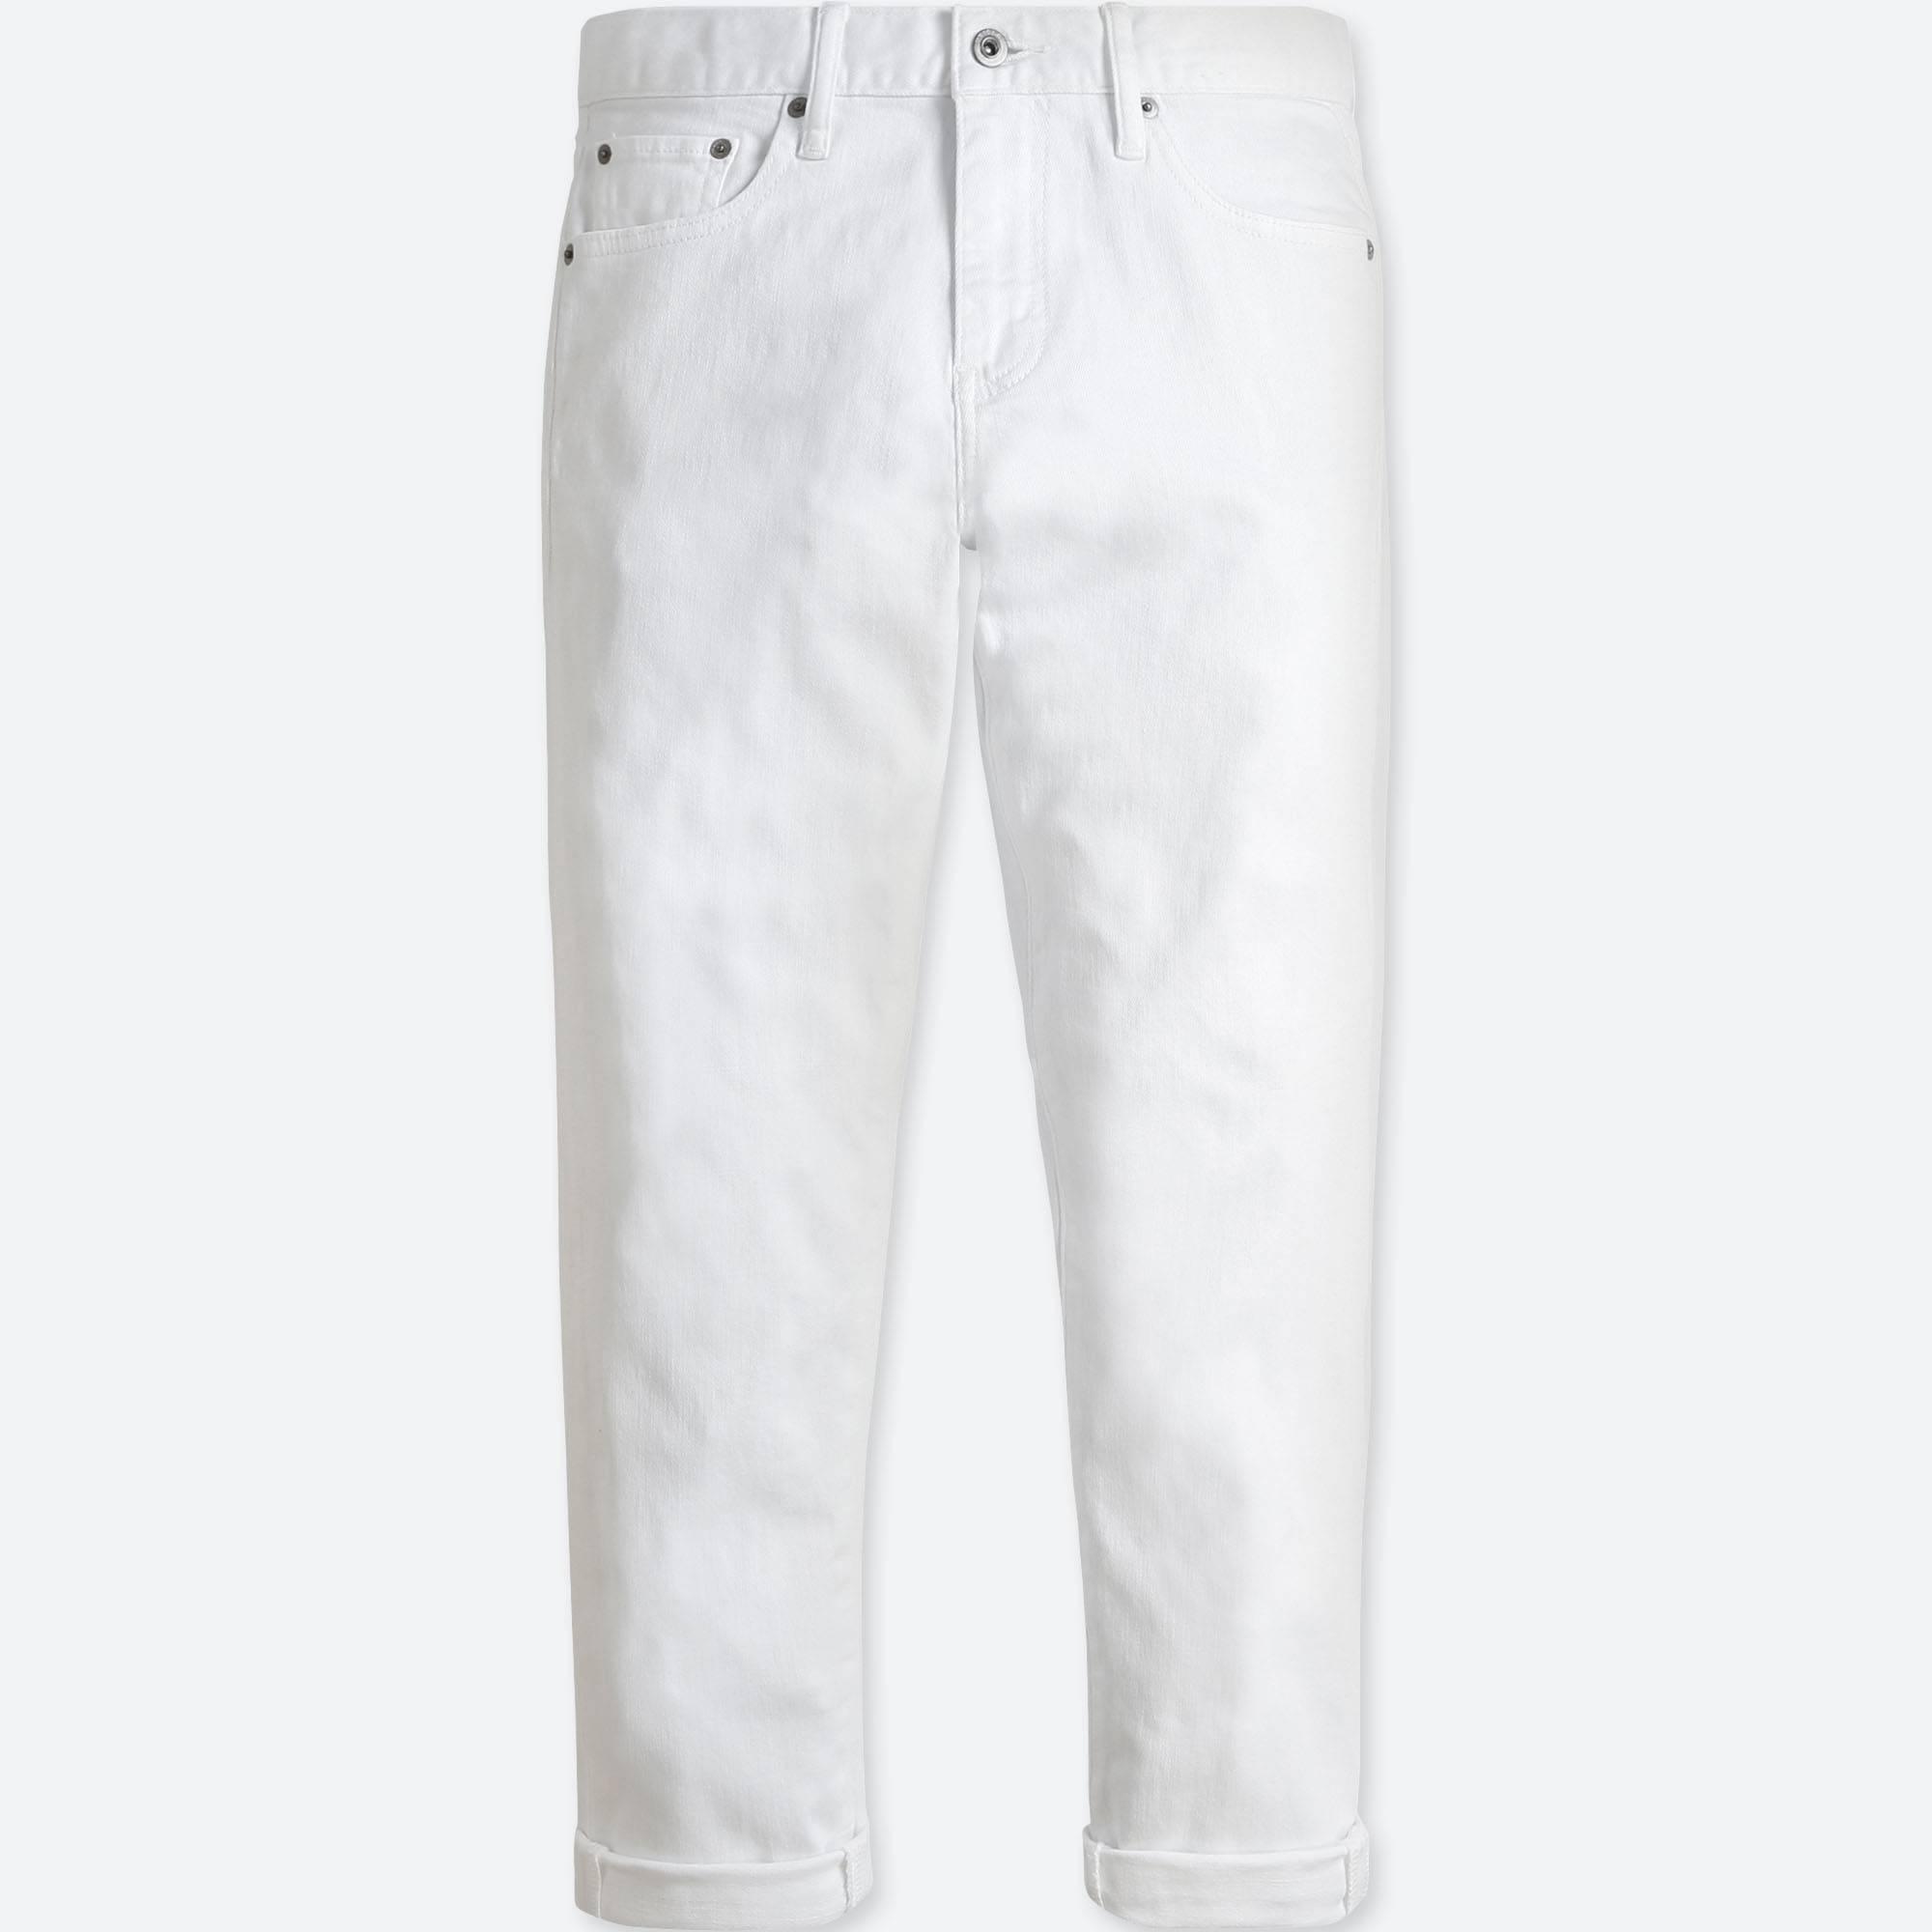 Goon Pants Excellent Soft Xl 44 Celana Daftar Harga Terkini Dry Premium Tape Super Jumbo Isi 50 Women Slim Boyfriend Fit Ankle Jeans